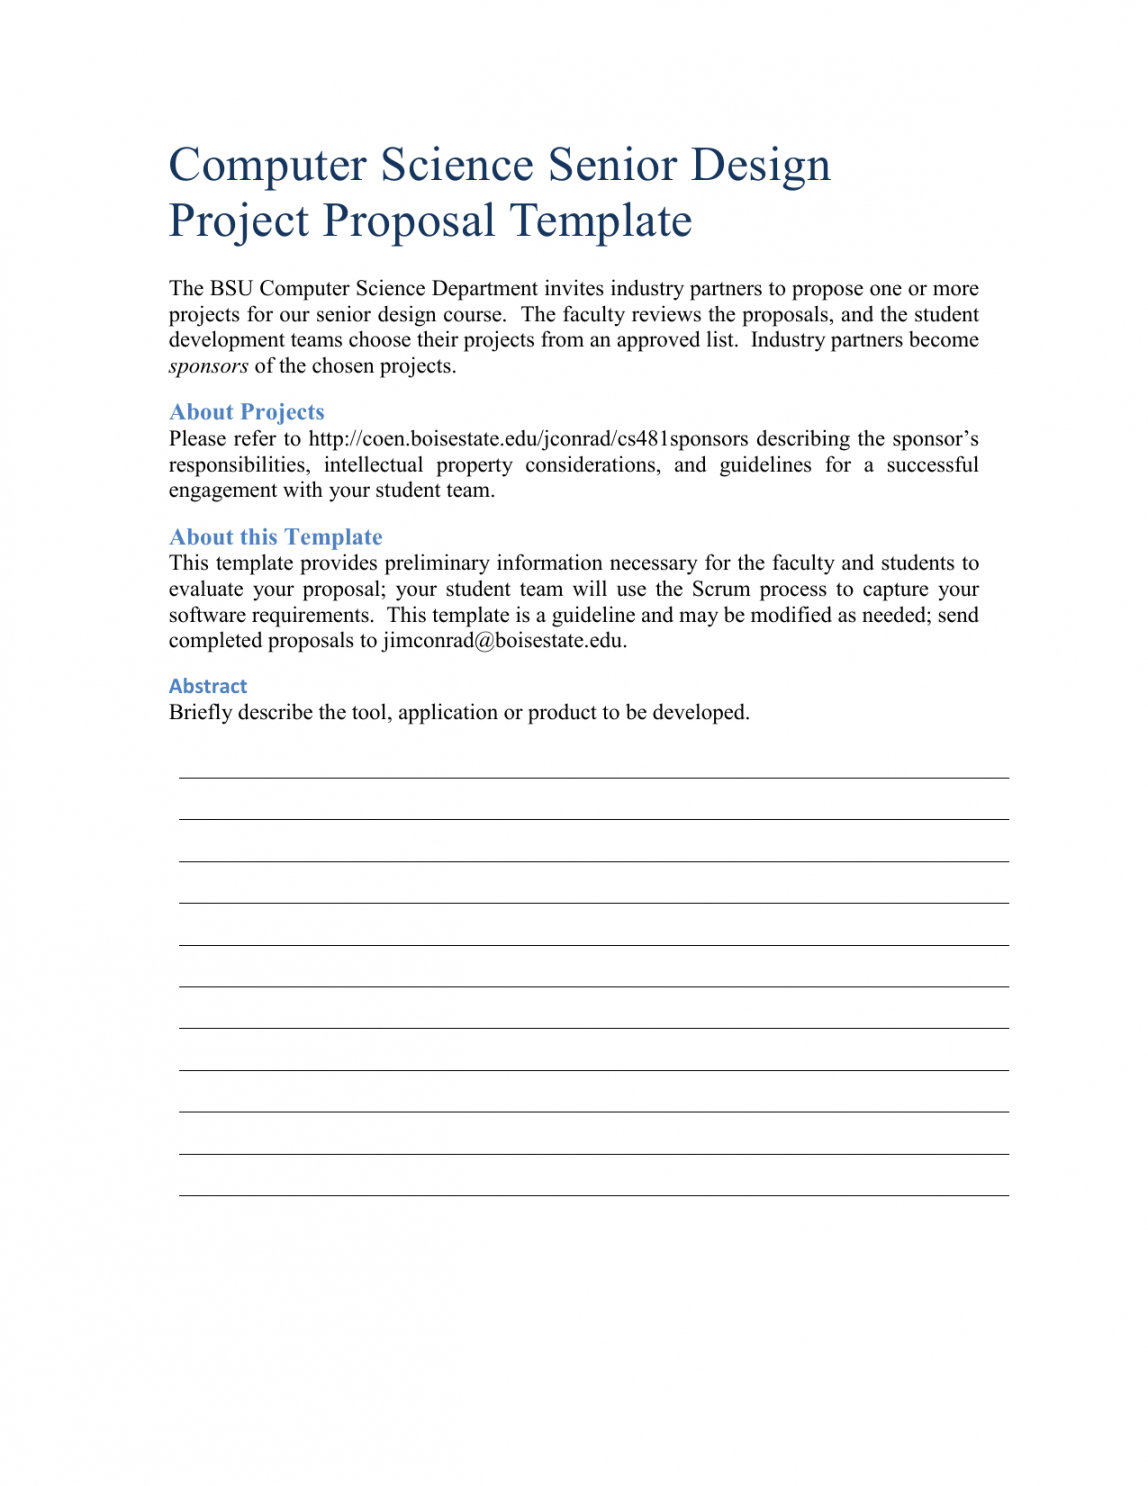 free computer science senior design project proposal template senior design project proposal template doc